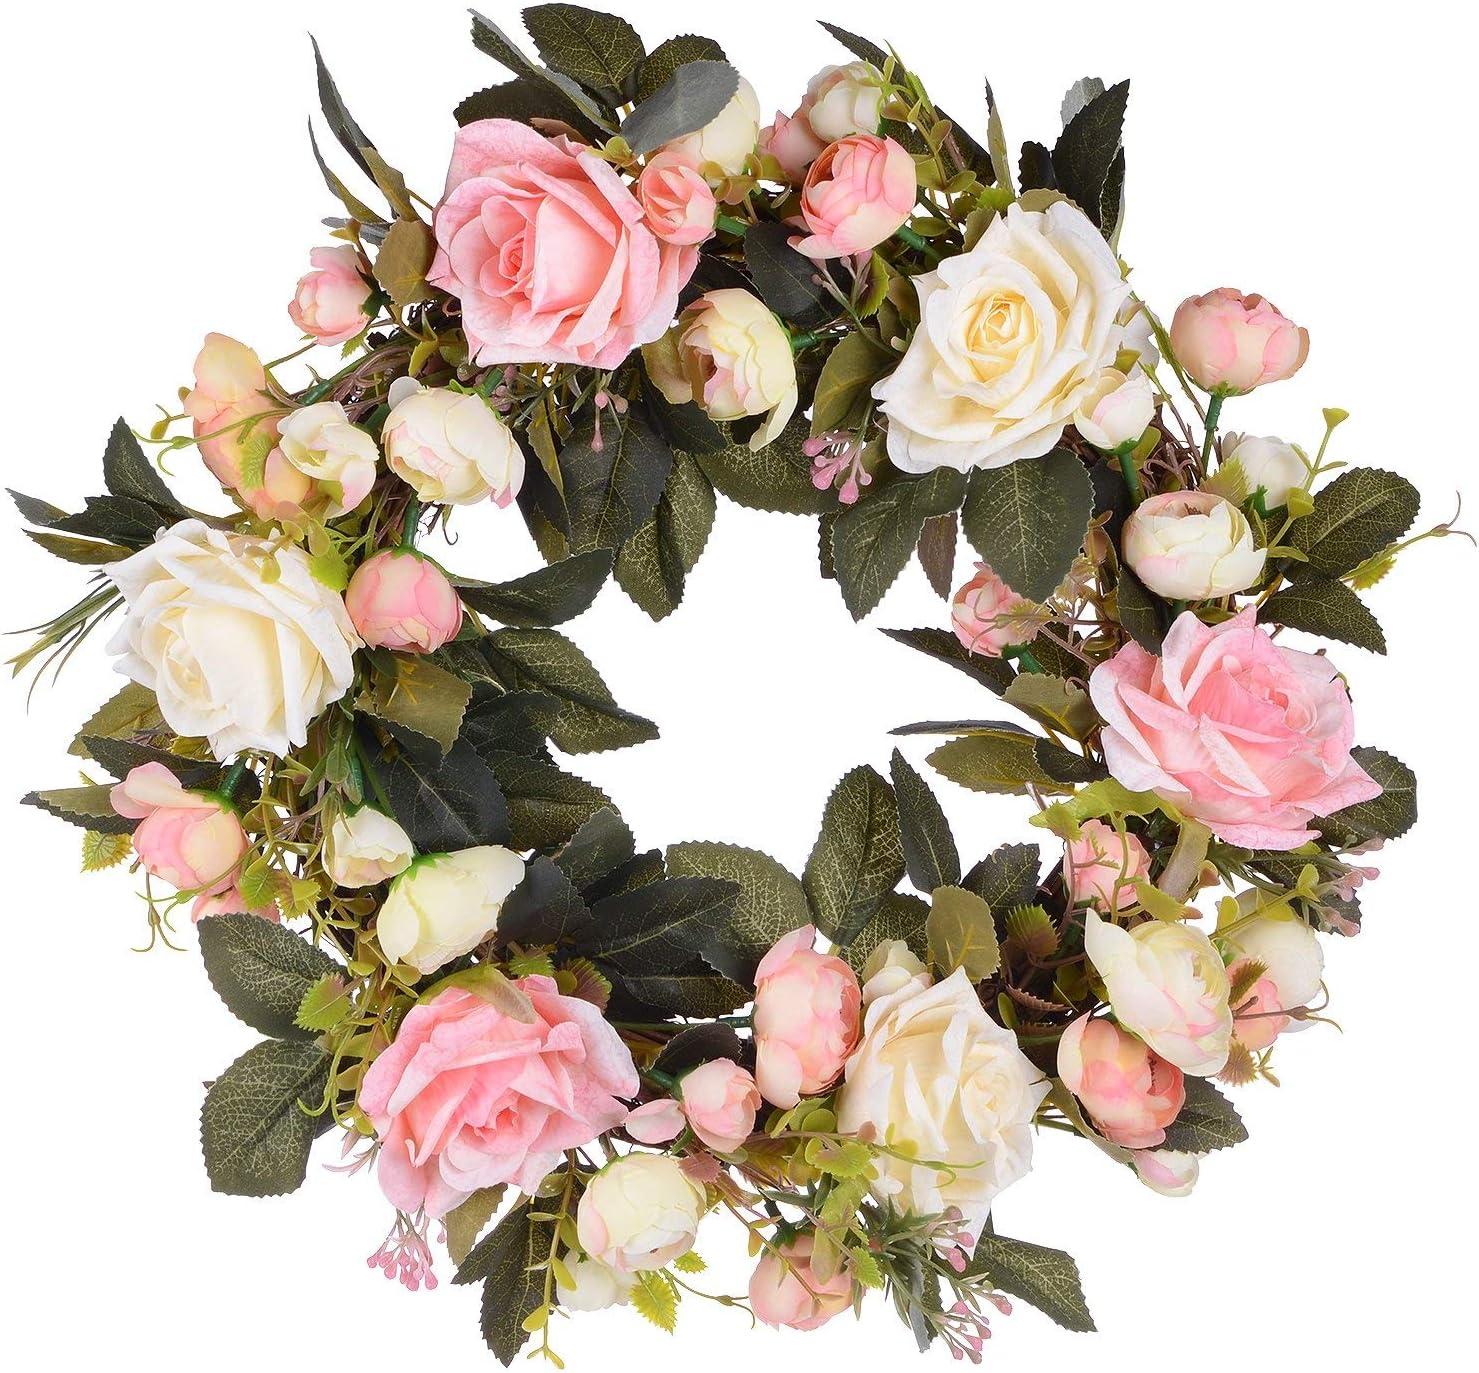 Artificial rose flower wreath for summer